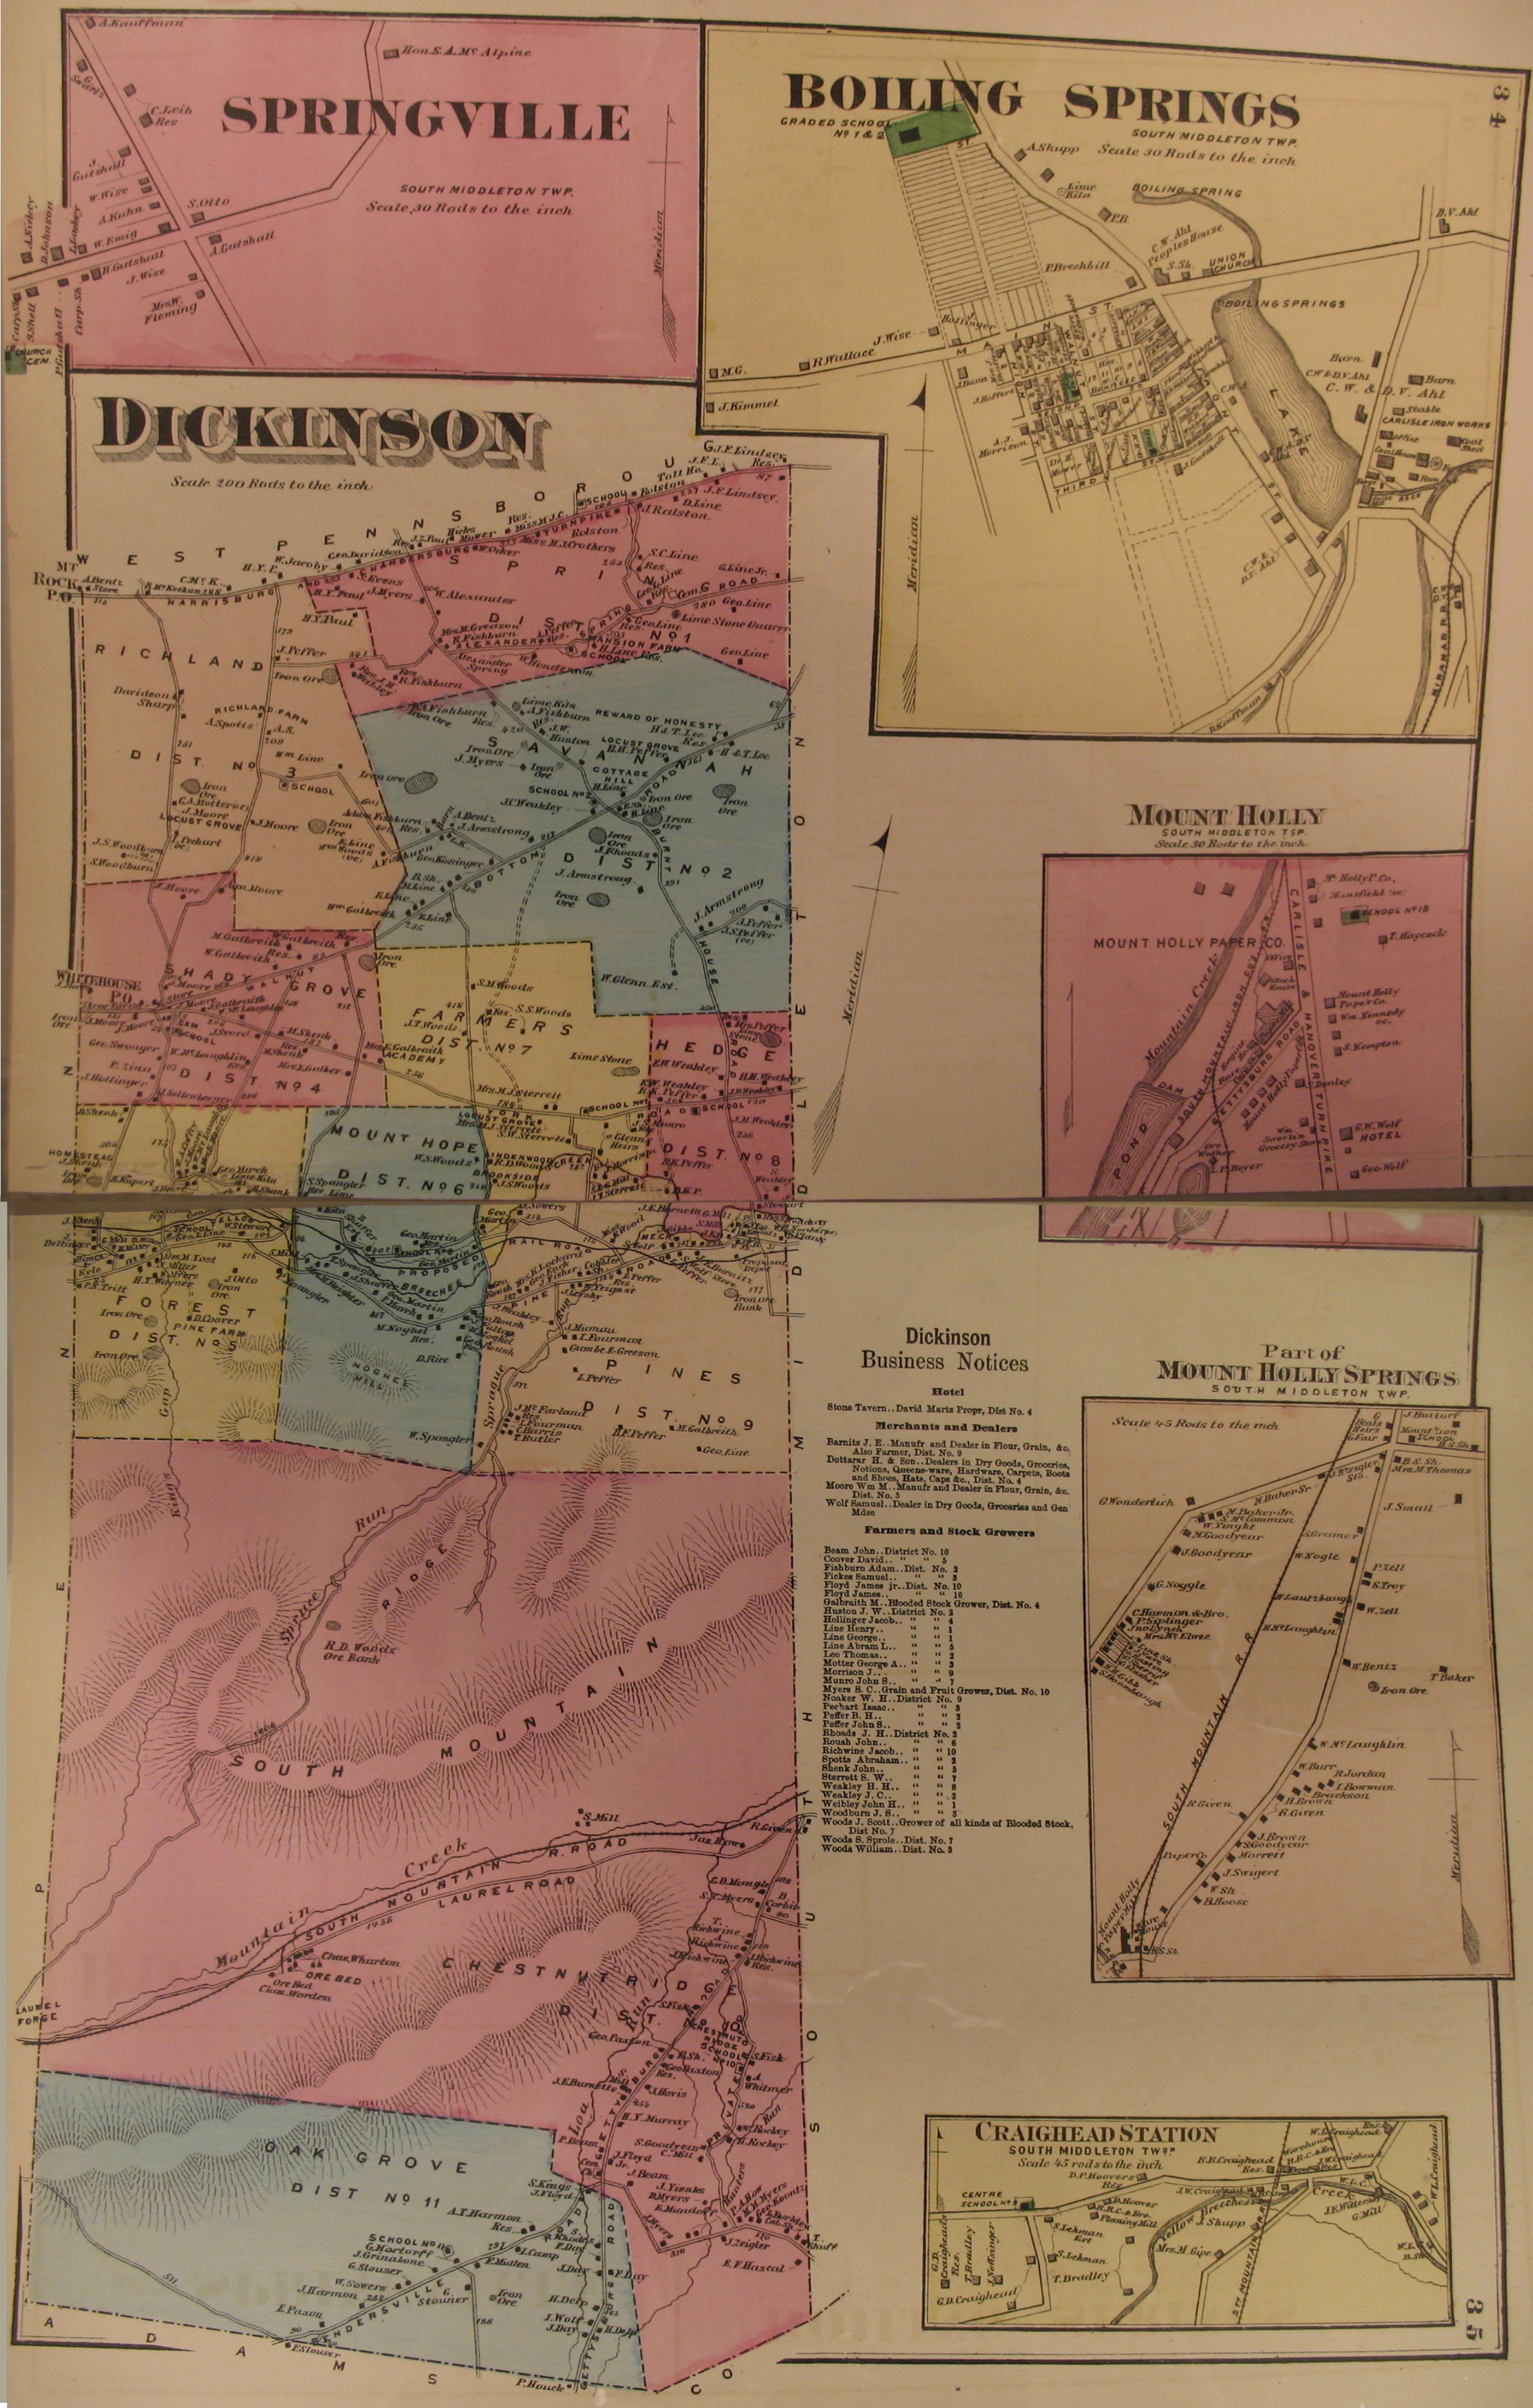 Cumberland County 1872 Atlas, Warrantee Mapsboiling springs town